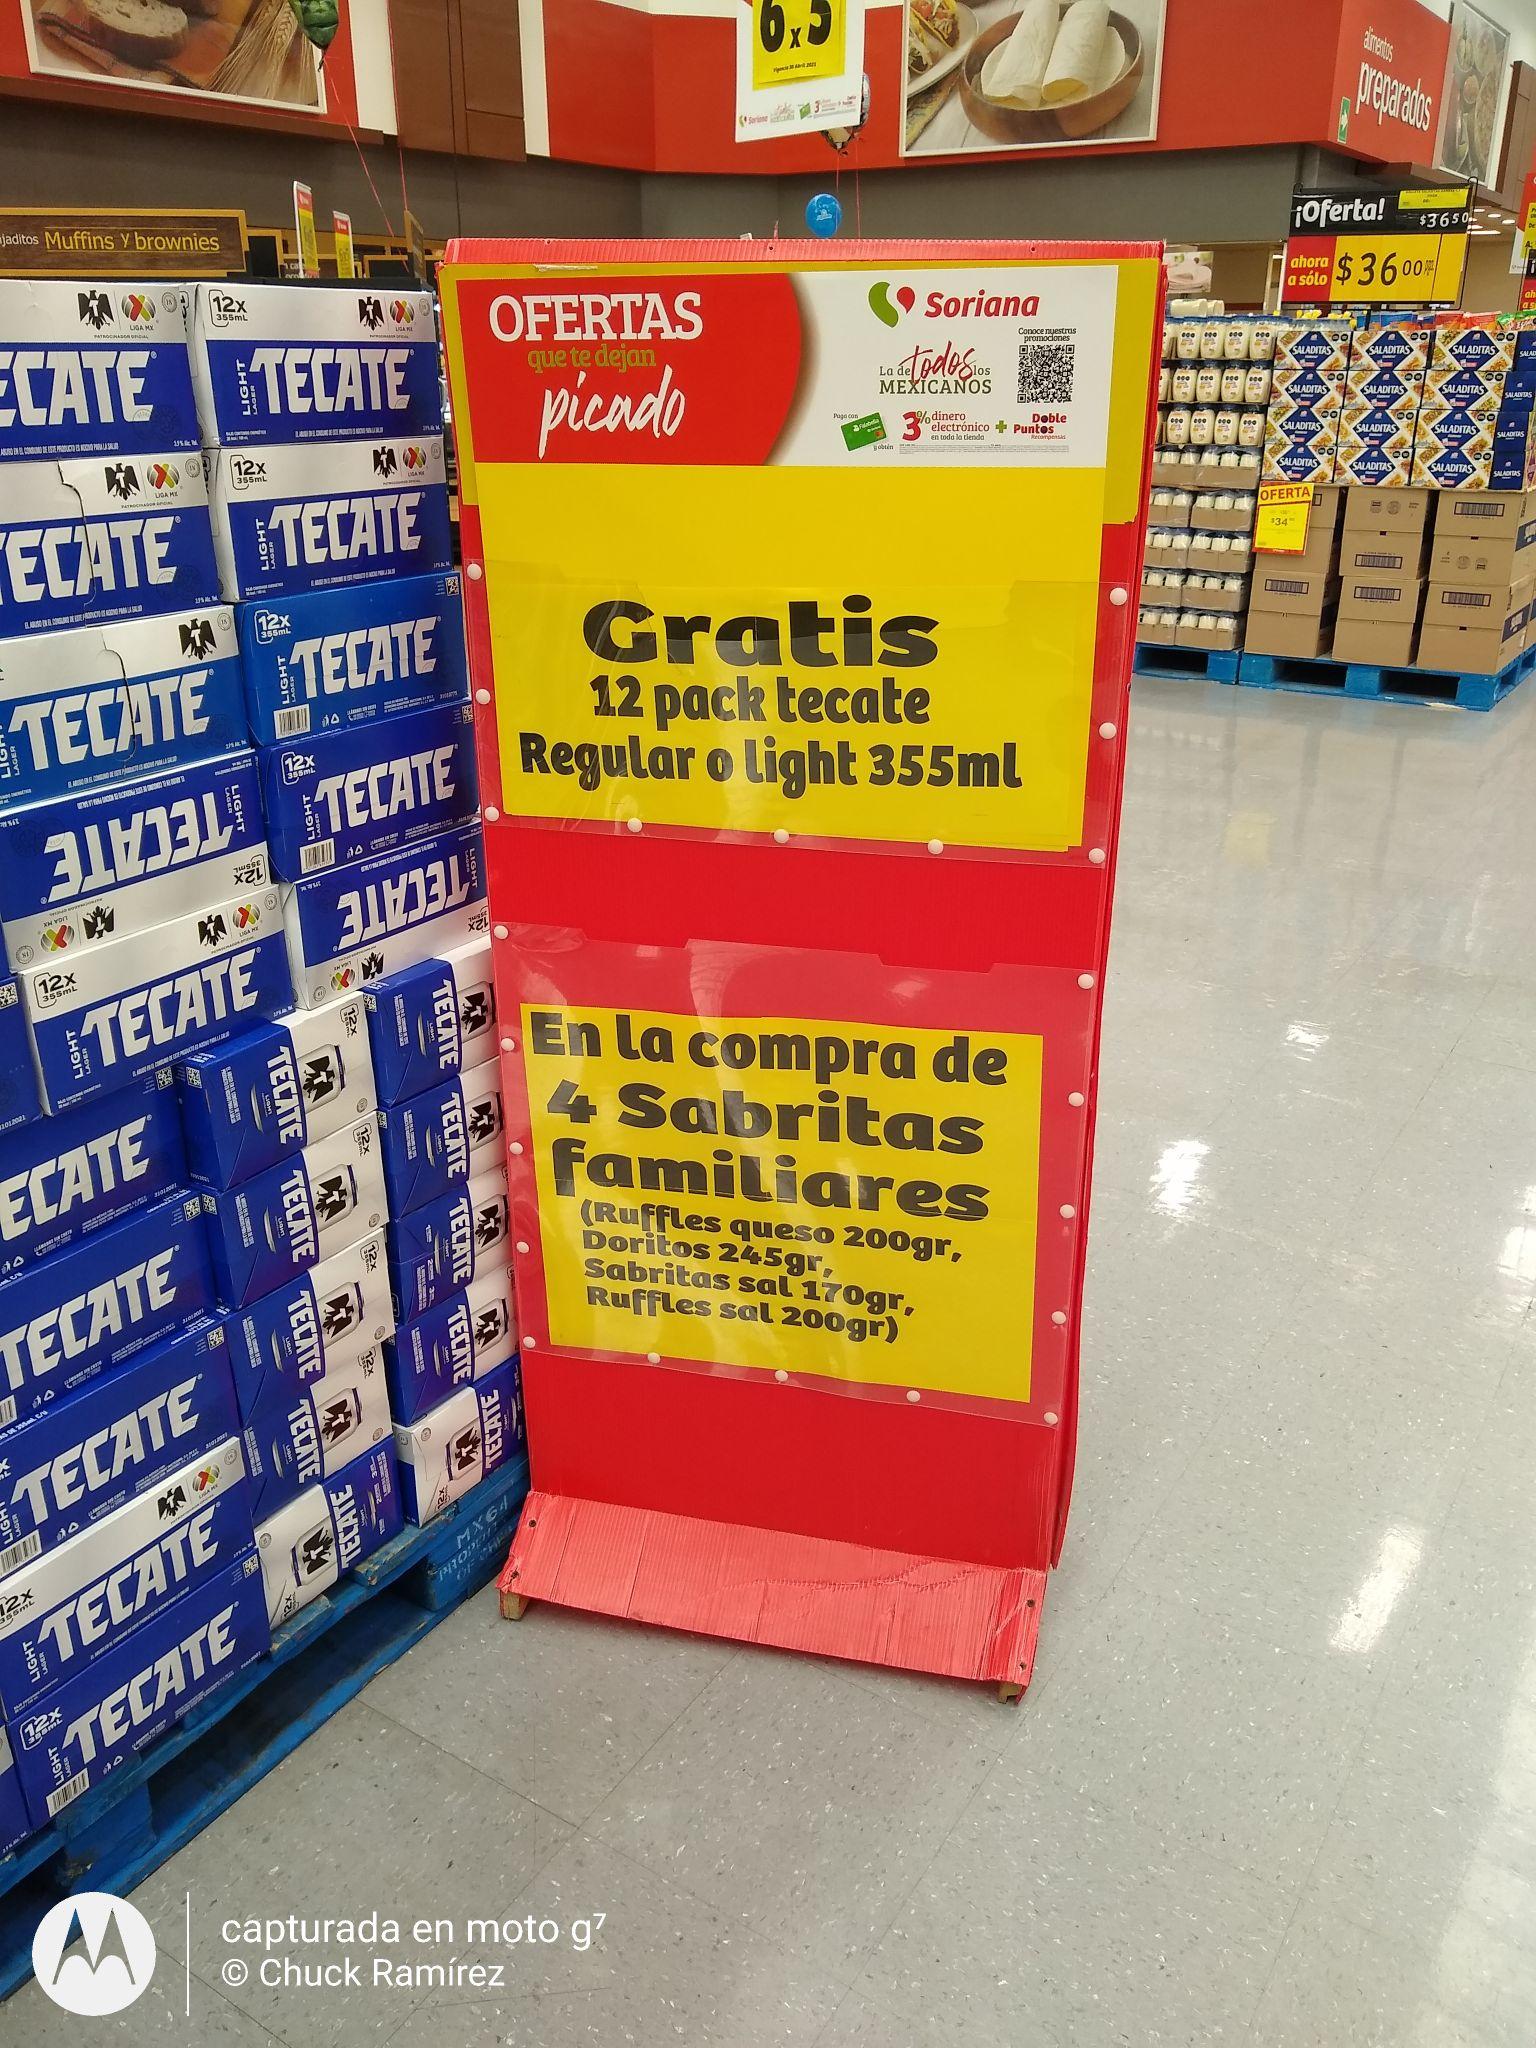 Soriana: Cerveza gratis en la compra de botana